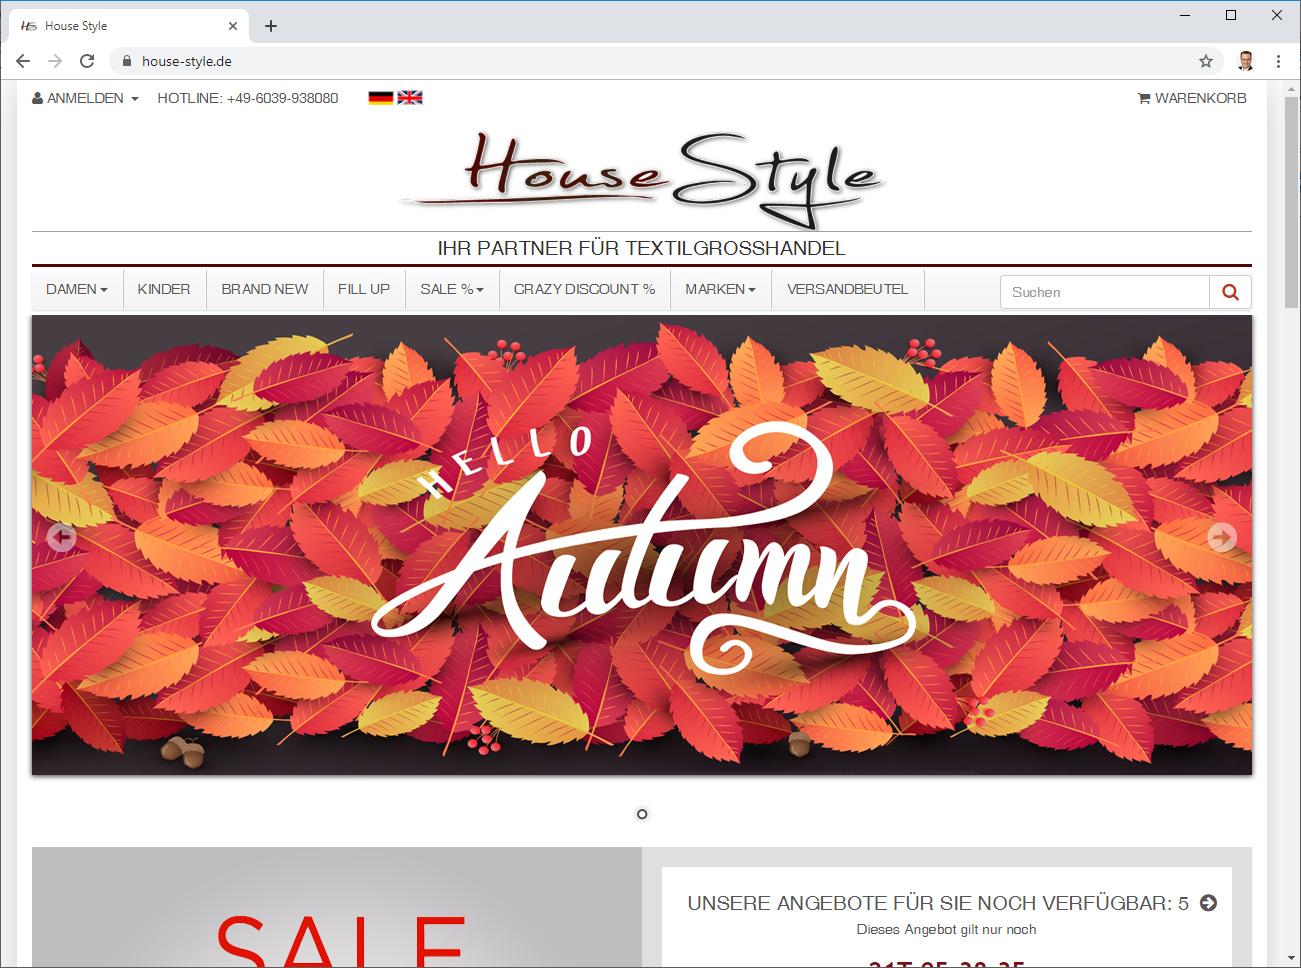 House Style - Textil-Grosshandel